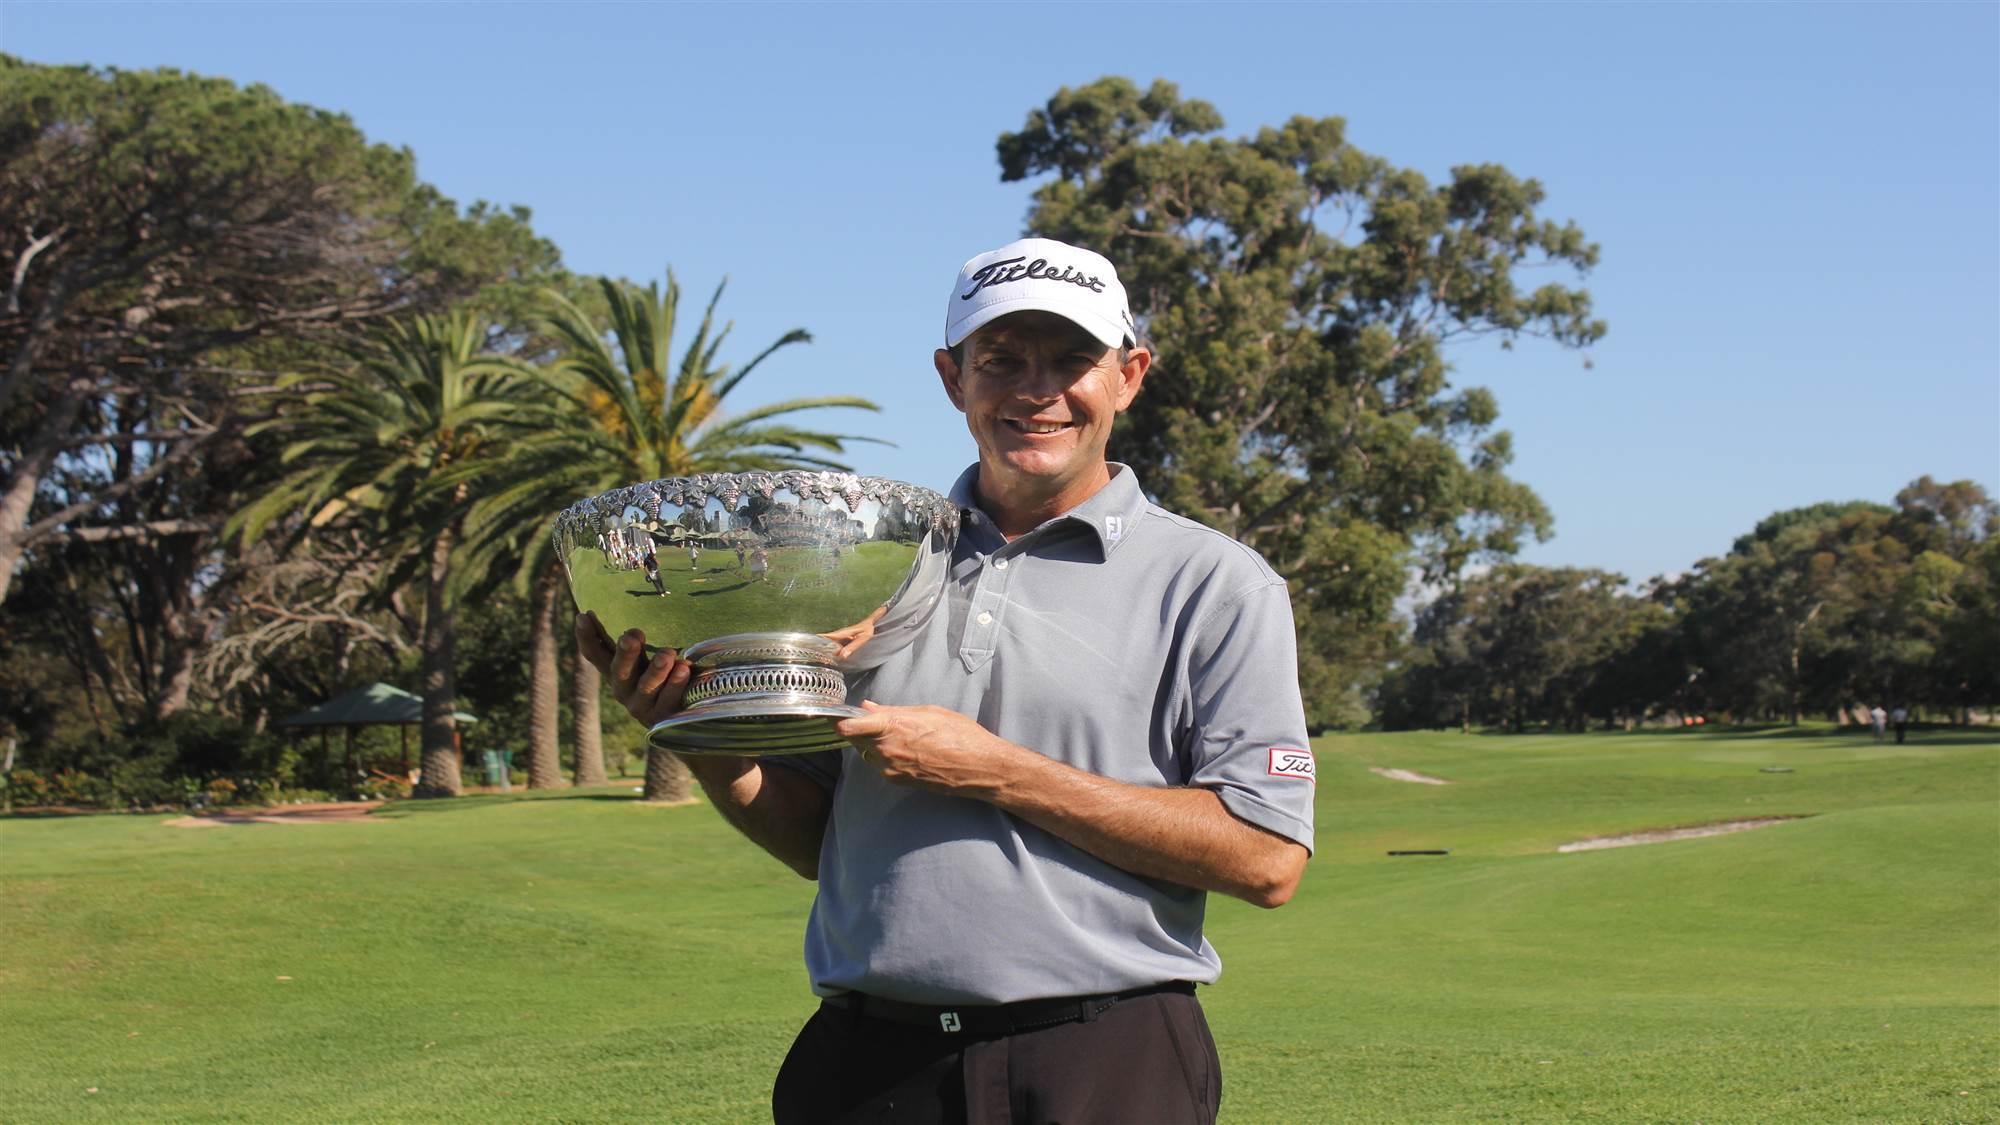 leaney longs for history making title golf australia. Black Bedroom Furniture Sets. Home Design Ideas